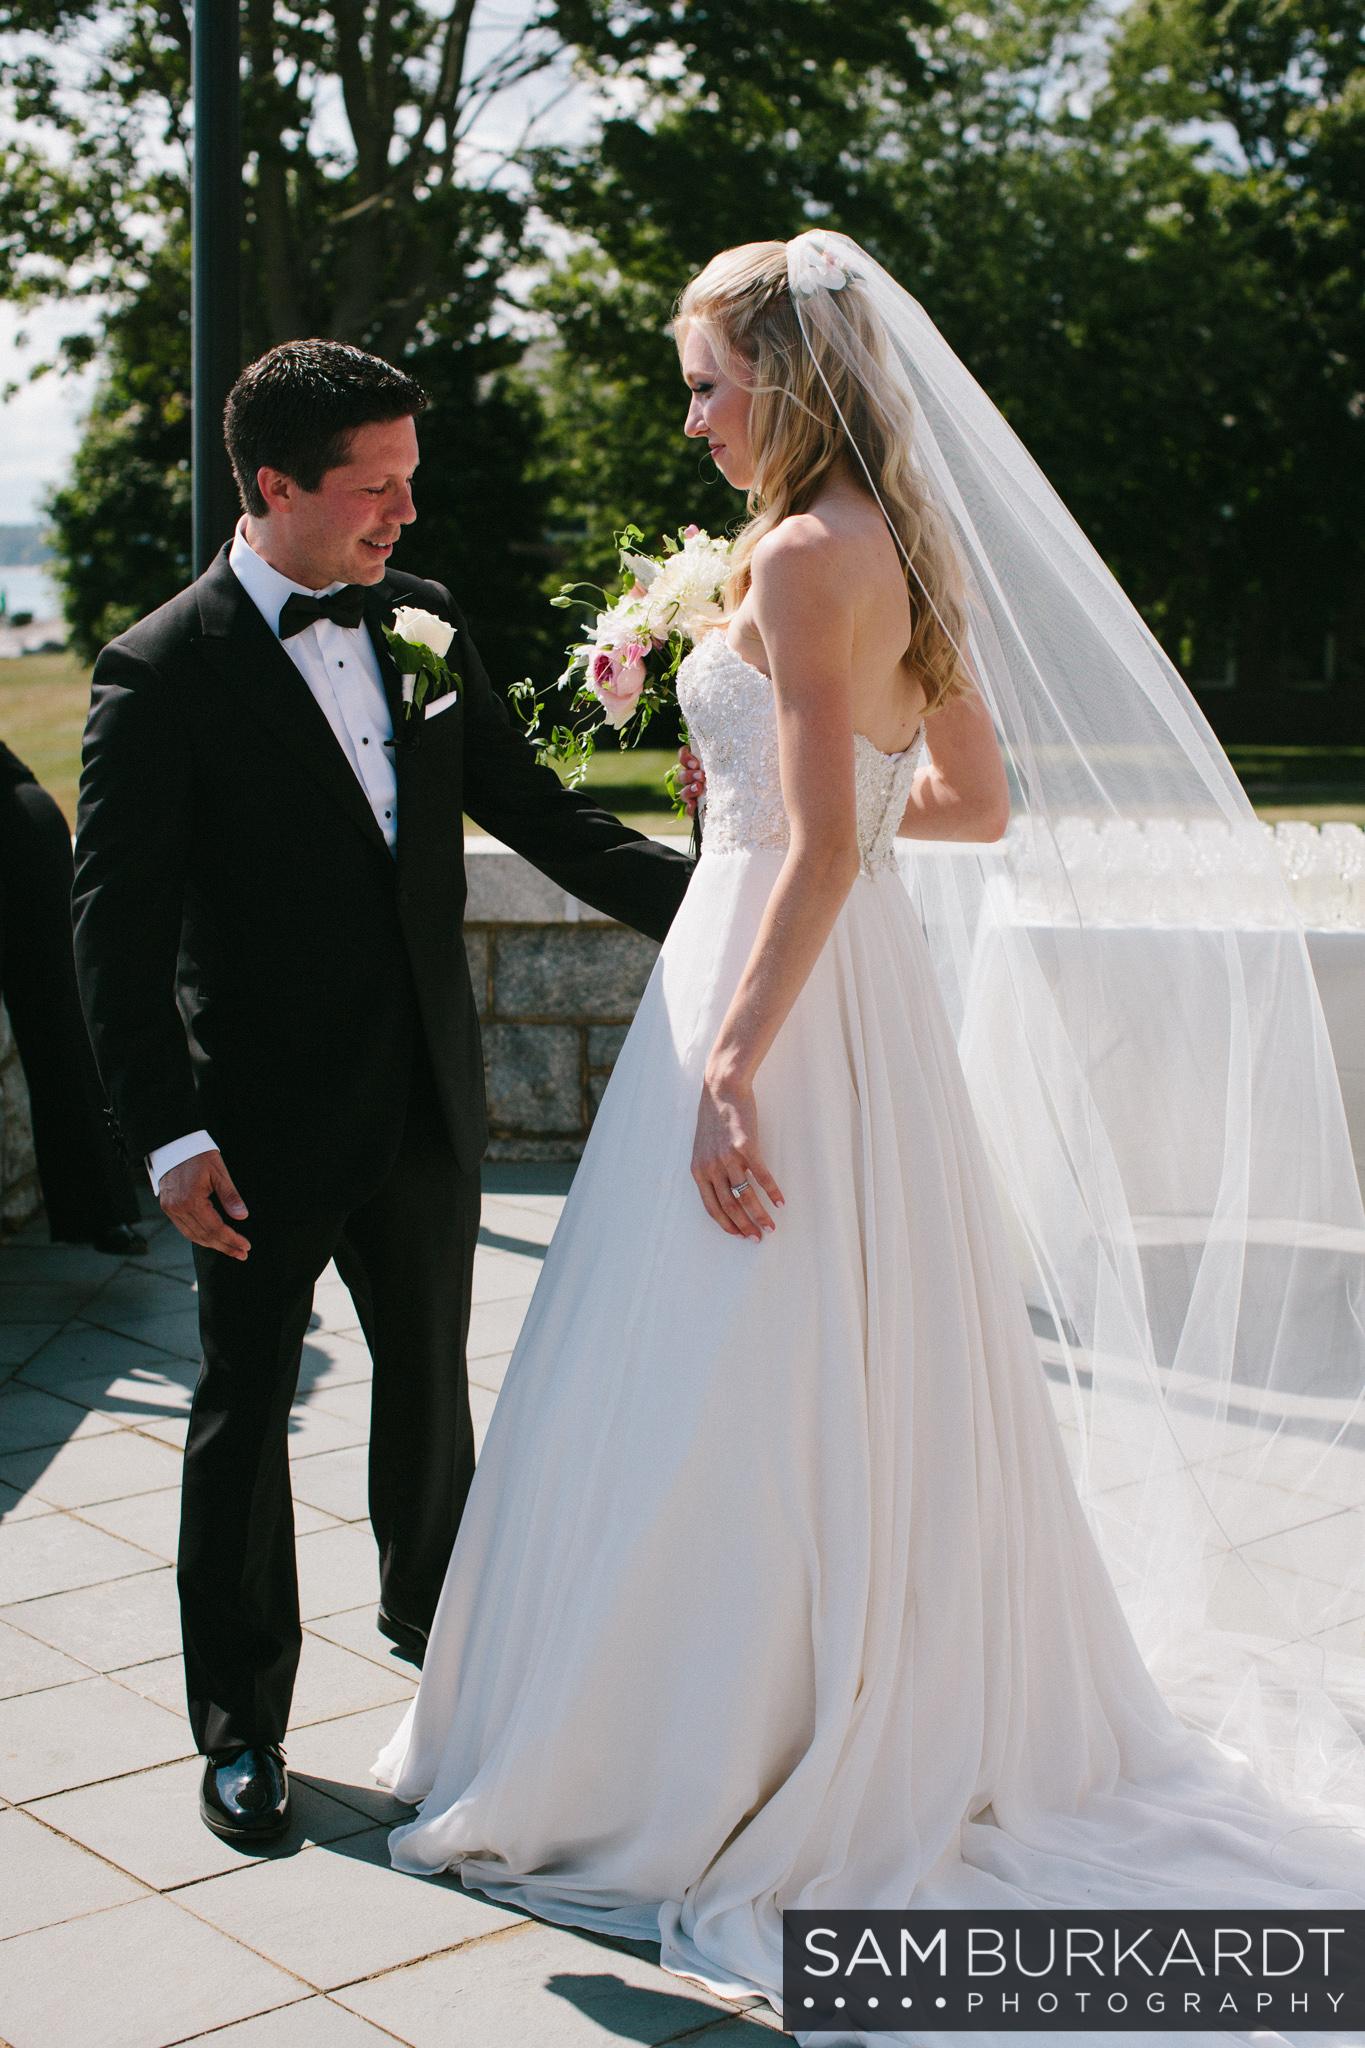 samburkardt_platz_moore_connecticut_branford_house_long_island_sound_august_photography_wedding_glamour_pink_0022.jpg